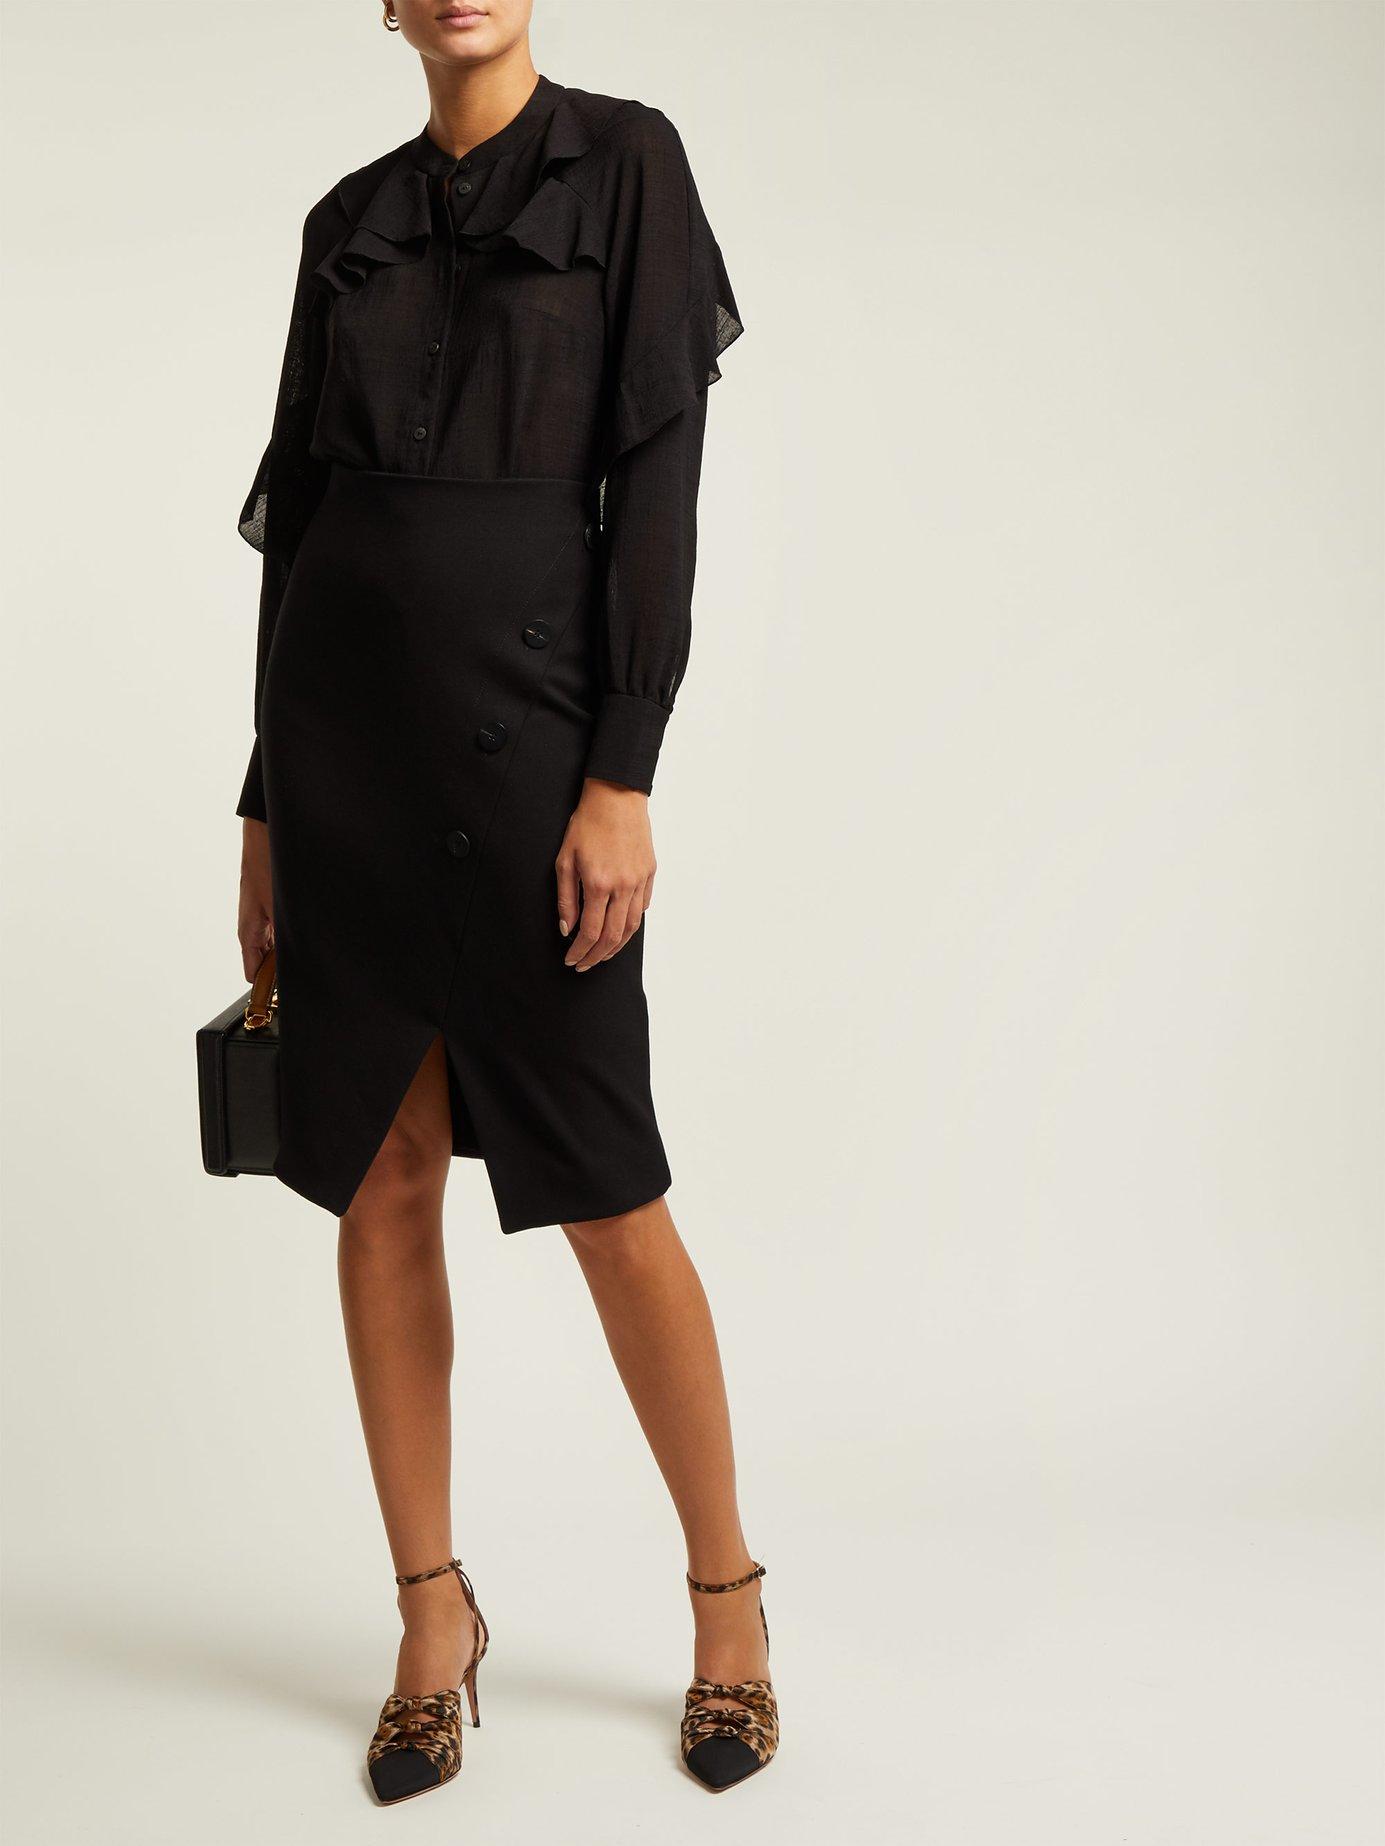 Ruffled voile blouse by Cefinn